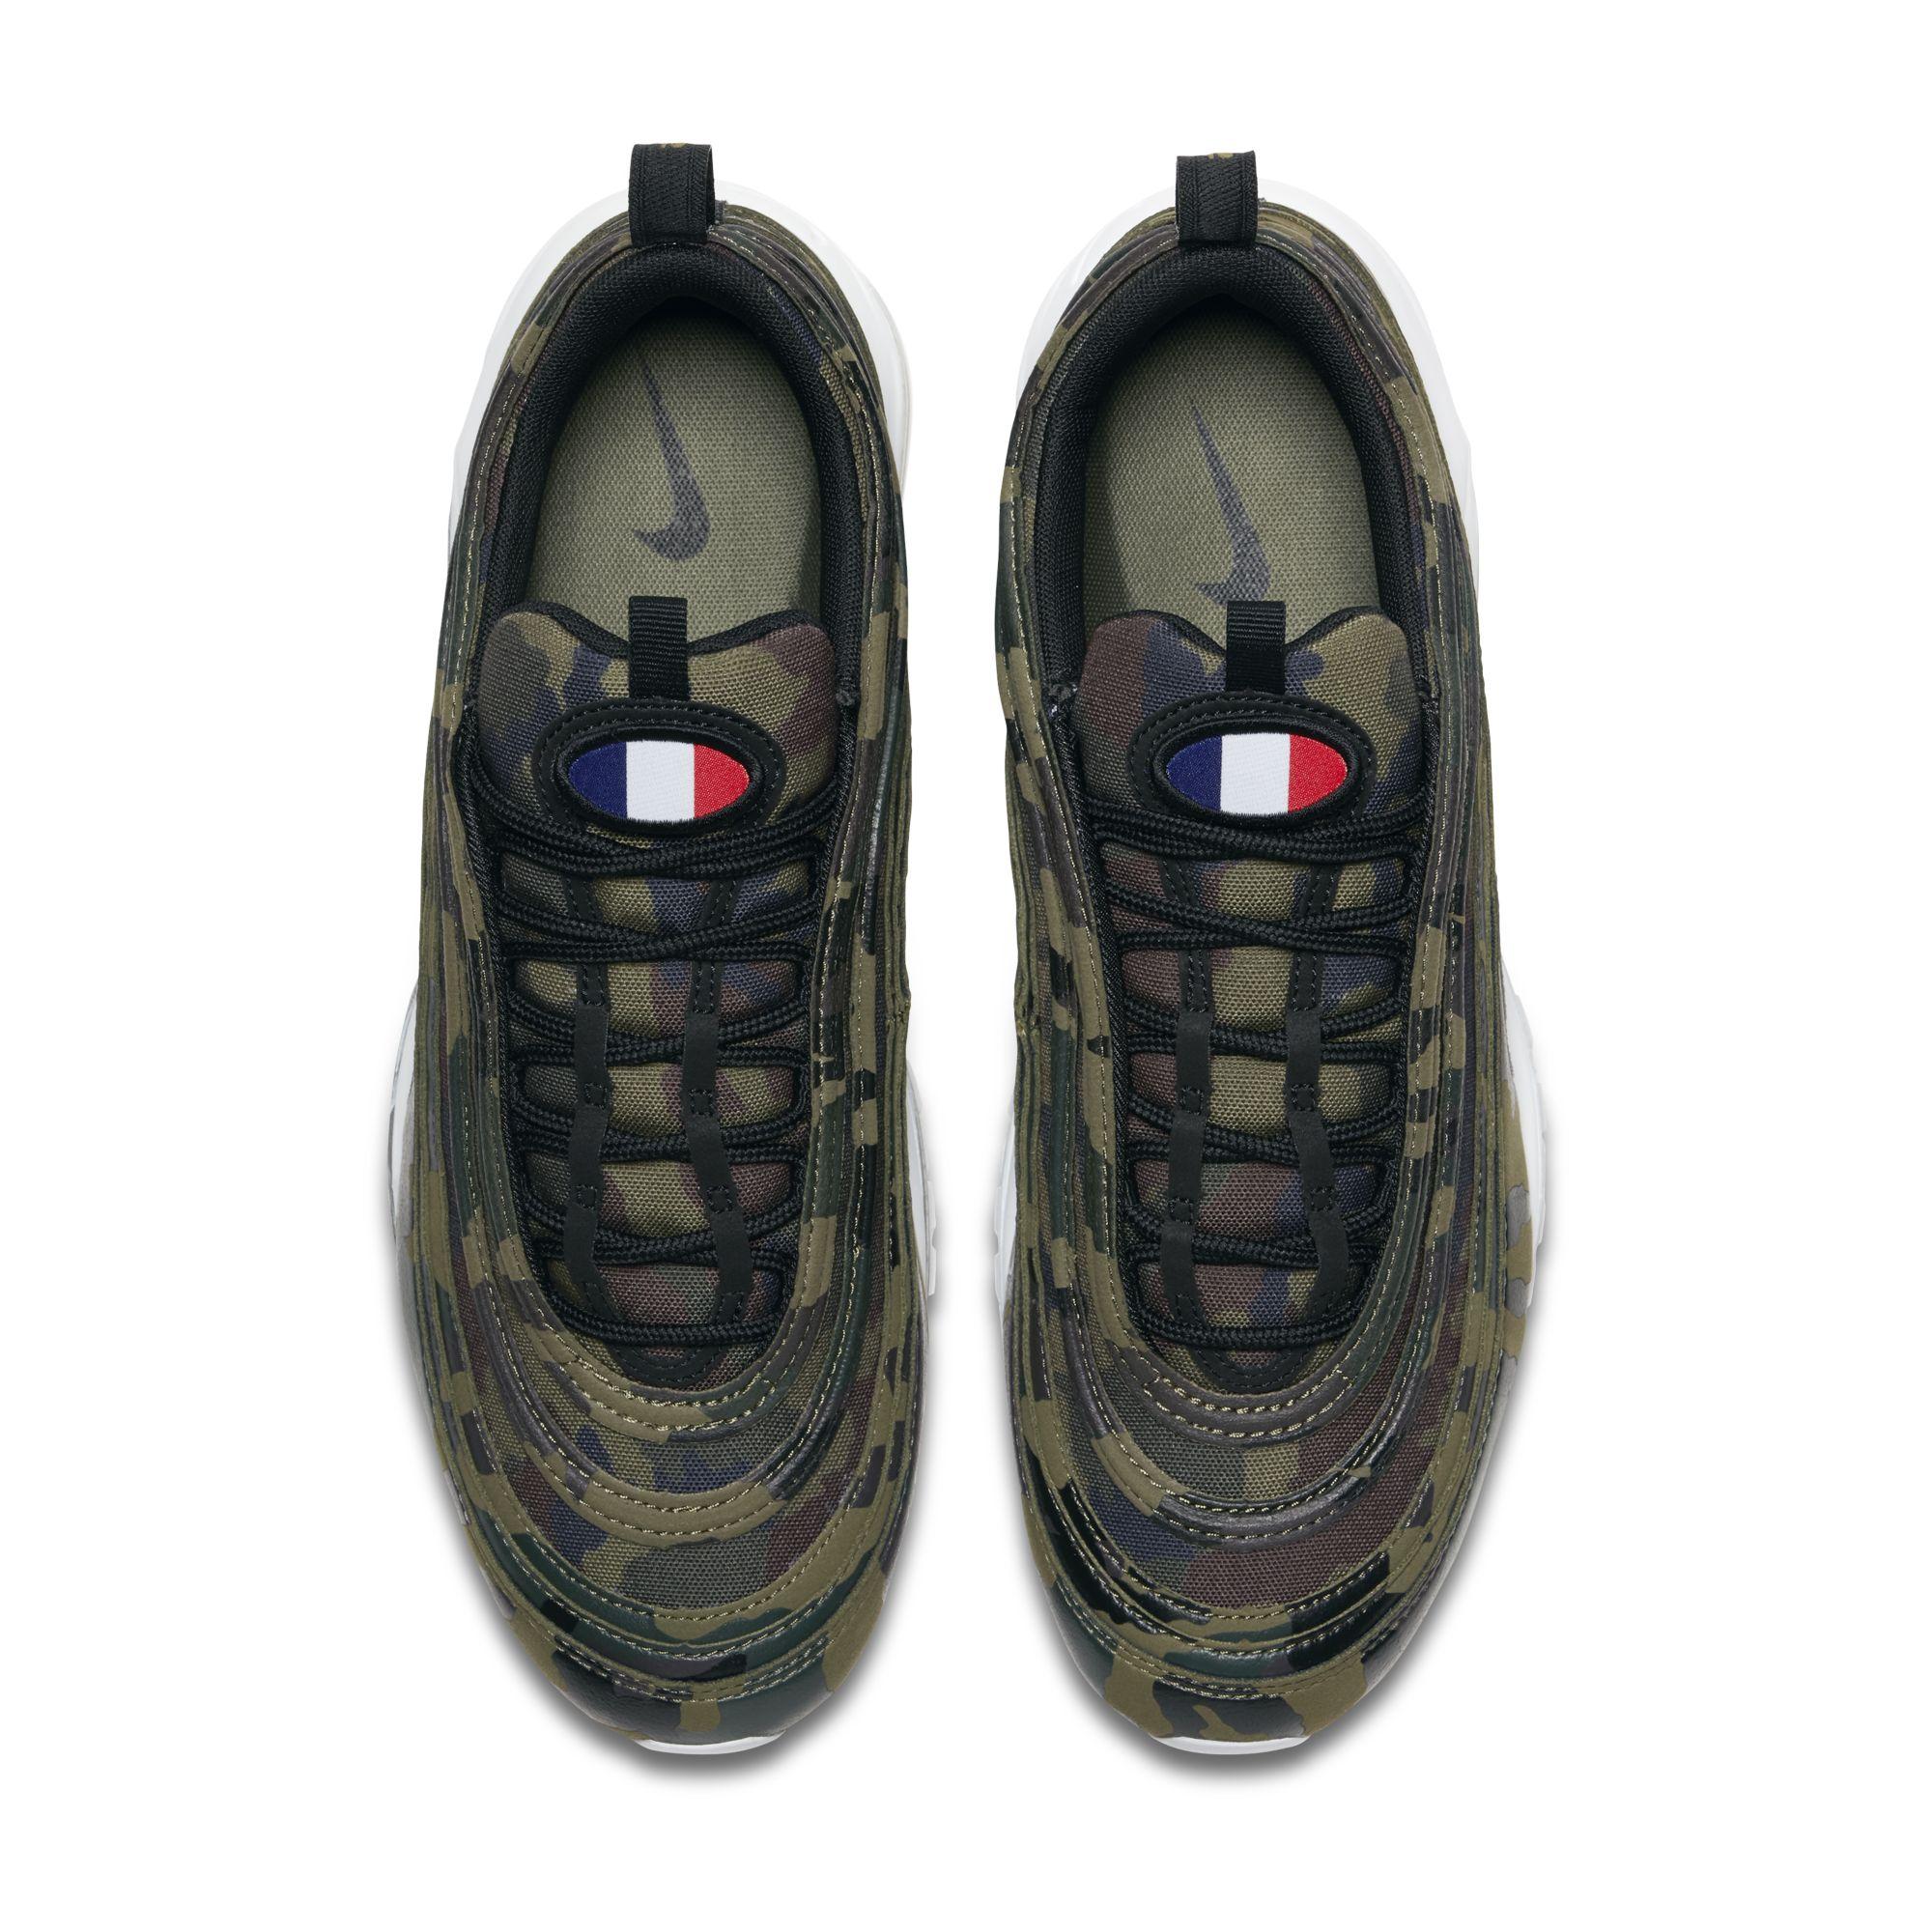 Nike Air Max 97 Premium Menn Vestlige Belter lnnkOMKho